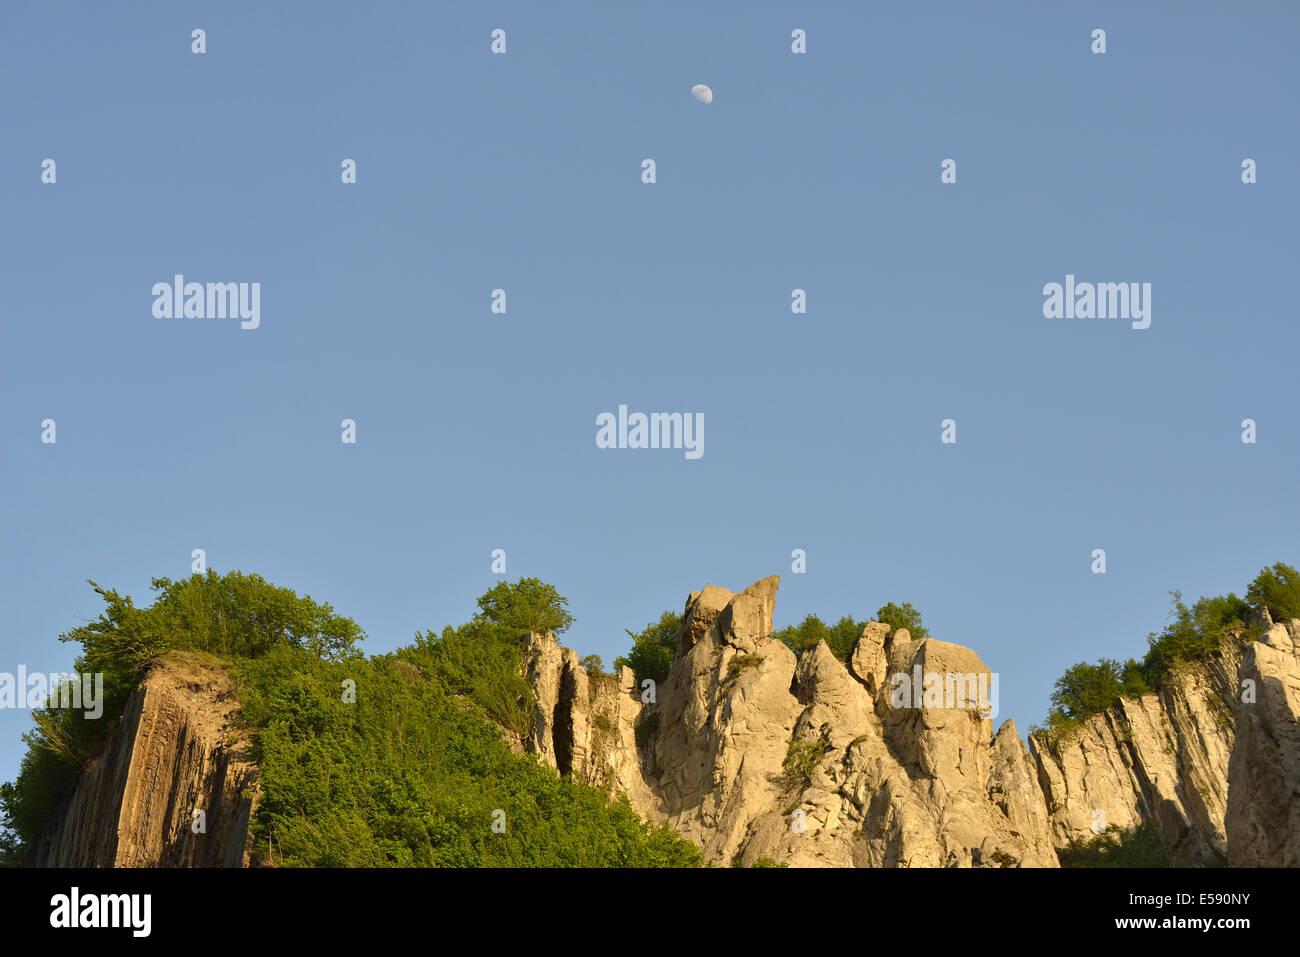 Landscape near the village of Lahic, Caucasus Mountains, Azerbaijan Stock Photo